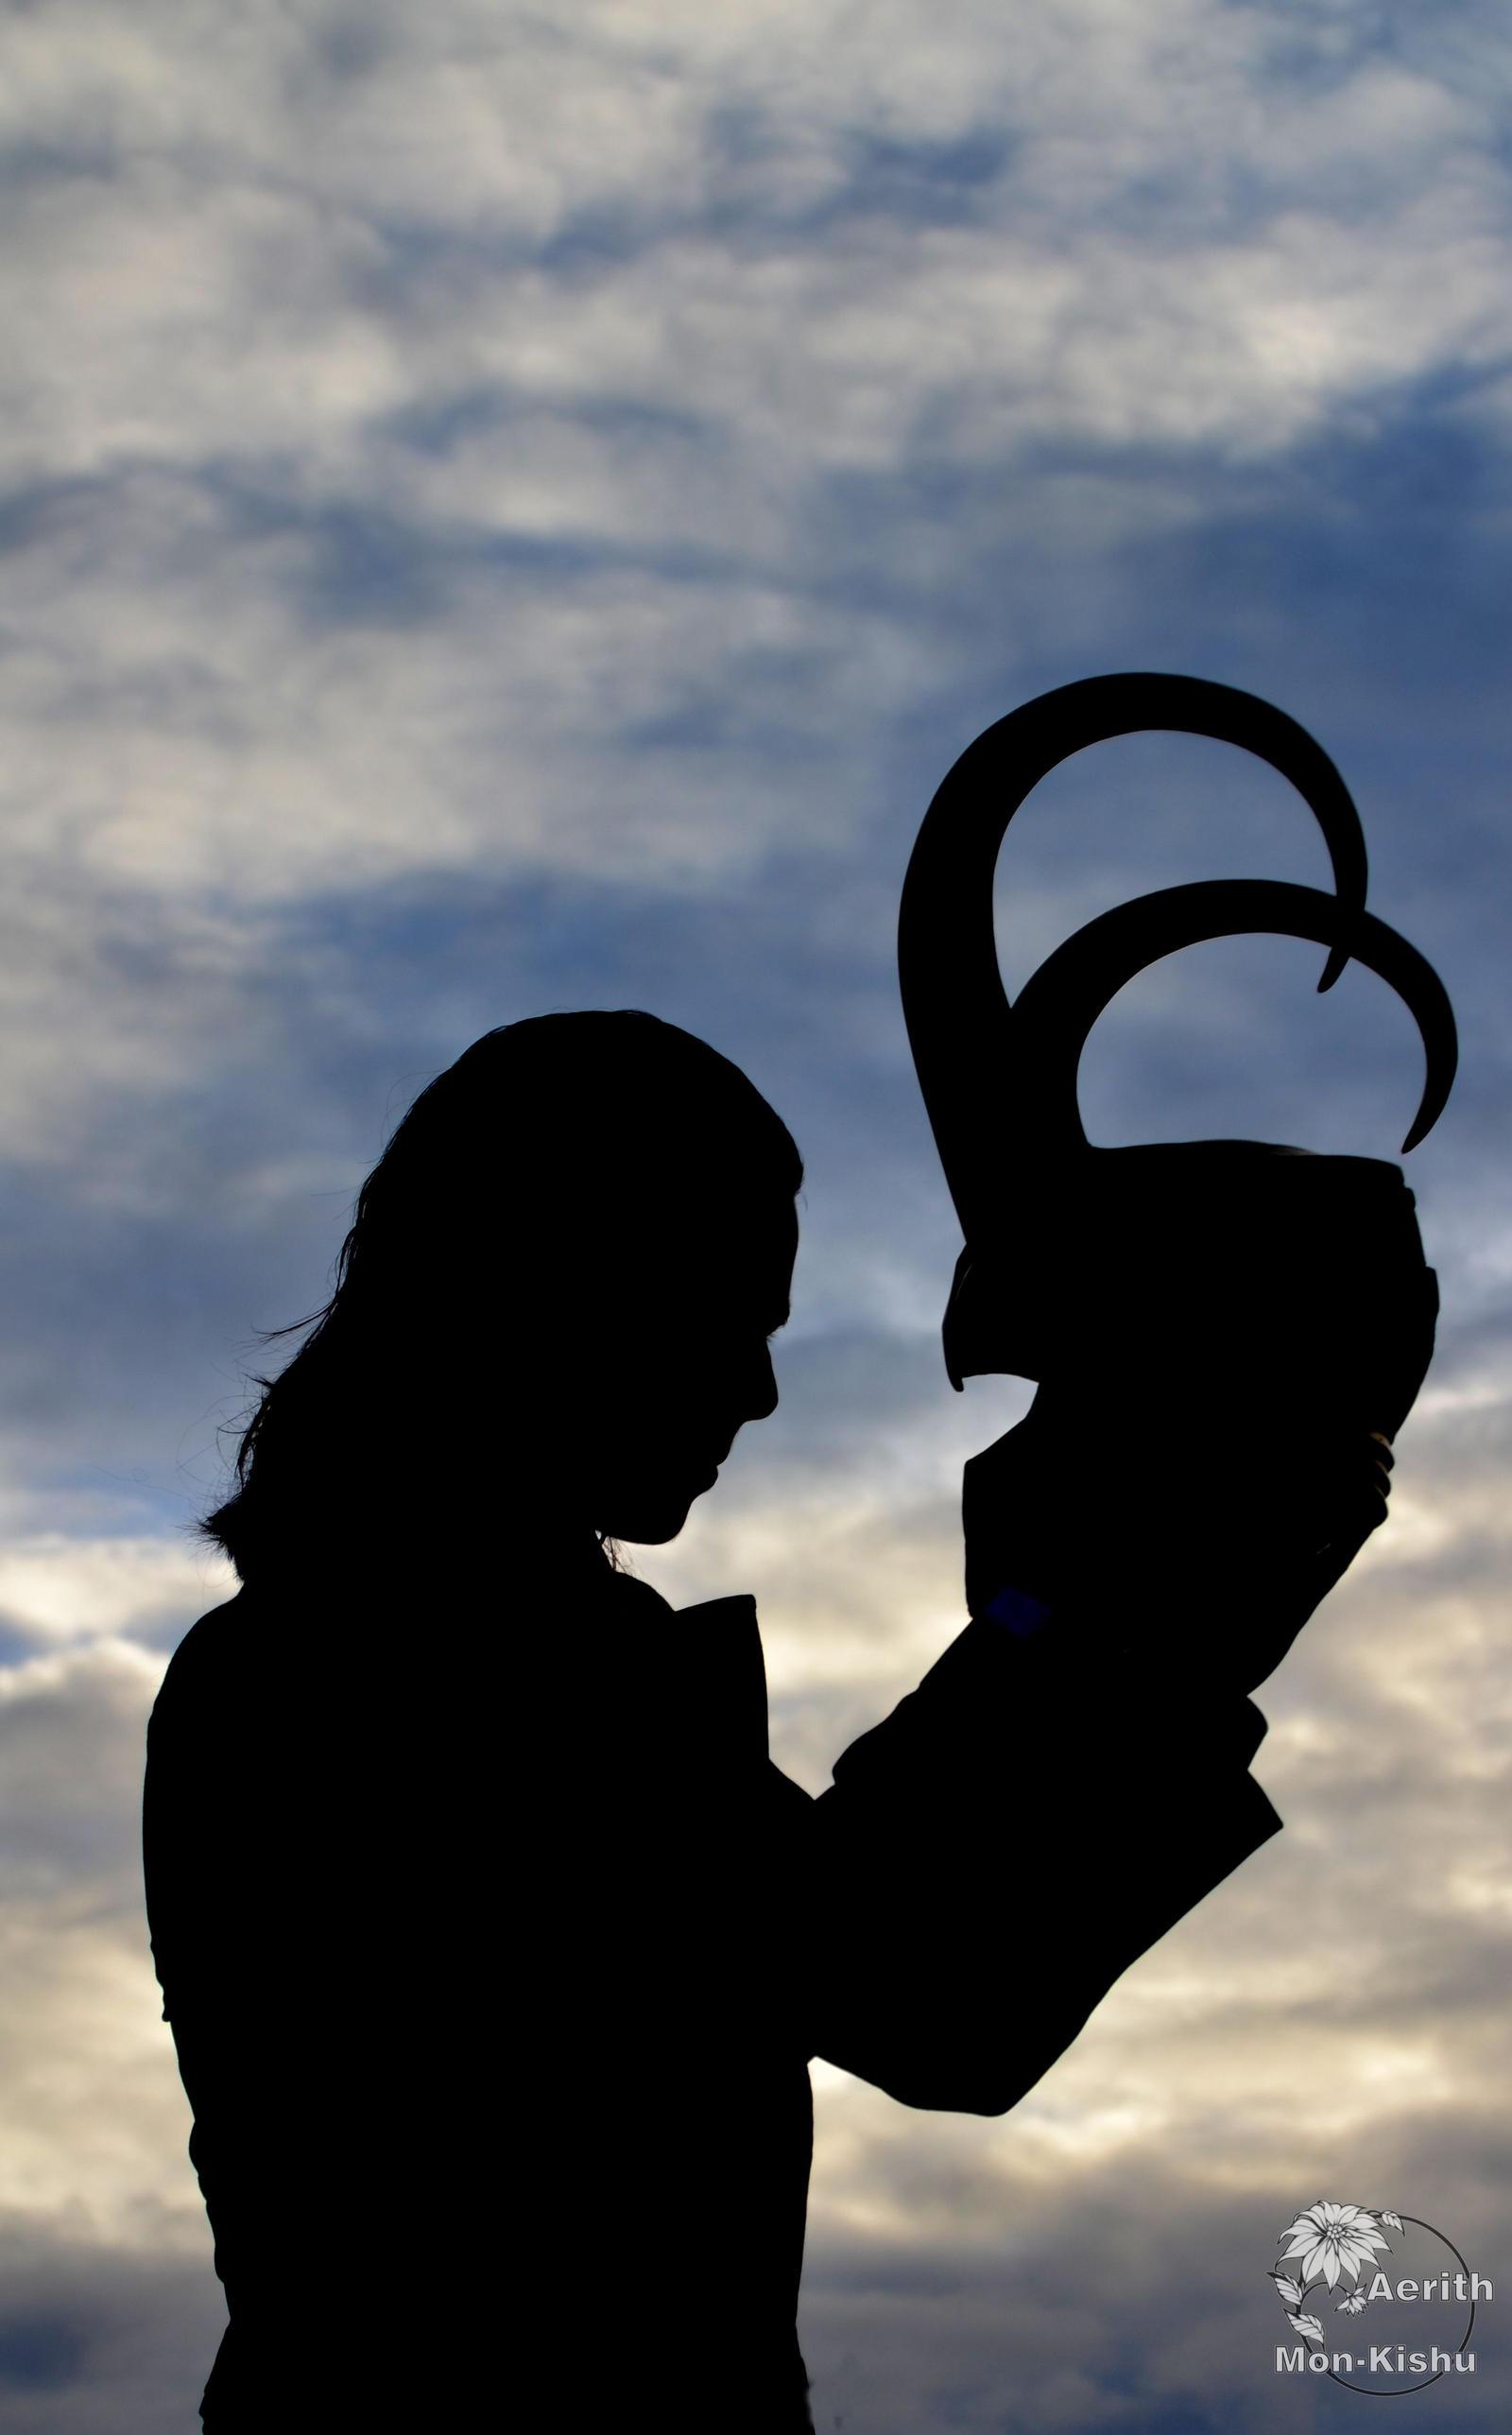 Loki Cosplay - Helmet in the sunset by Mon-Kishu